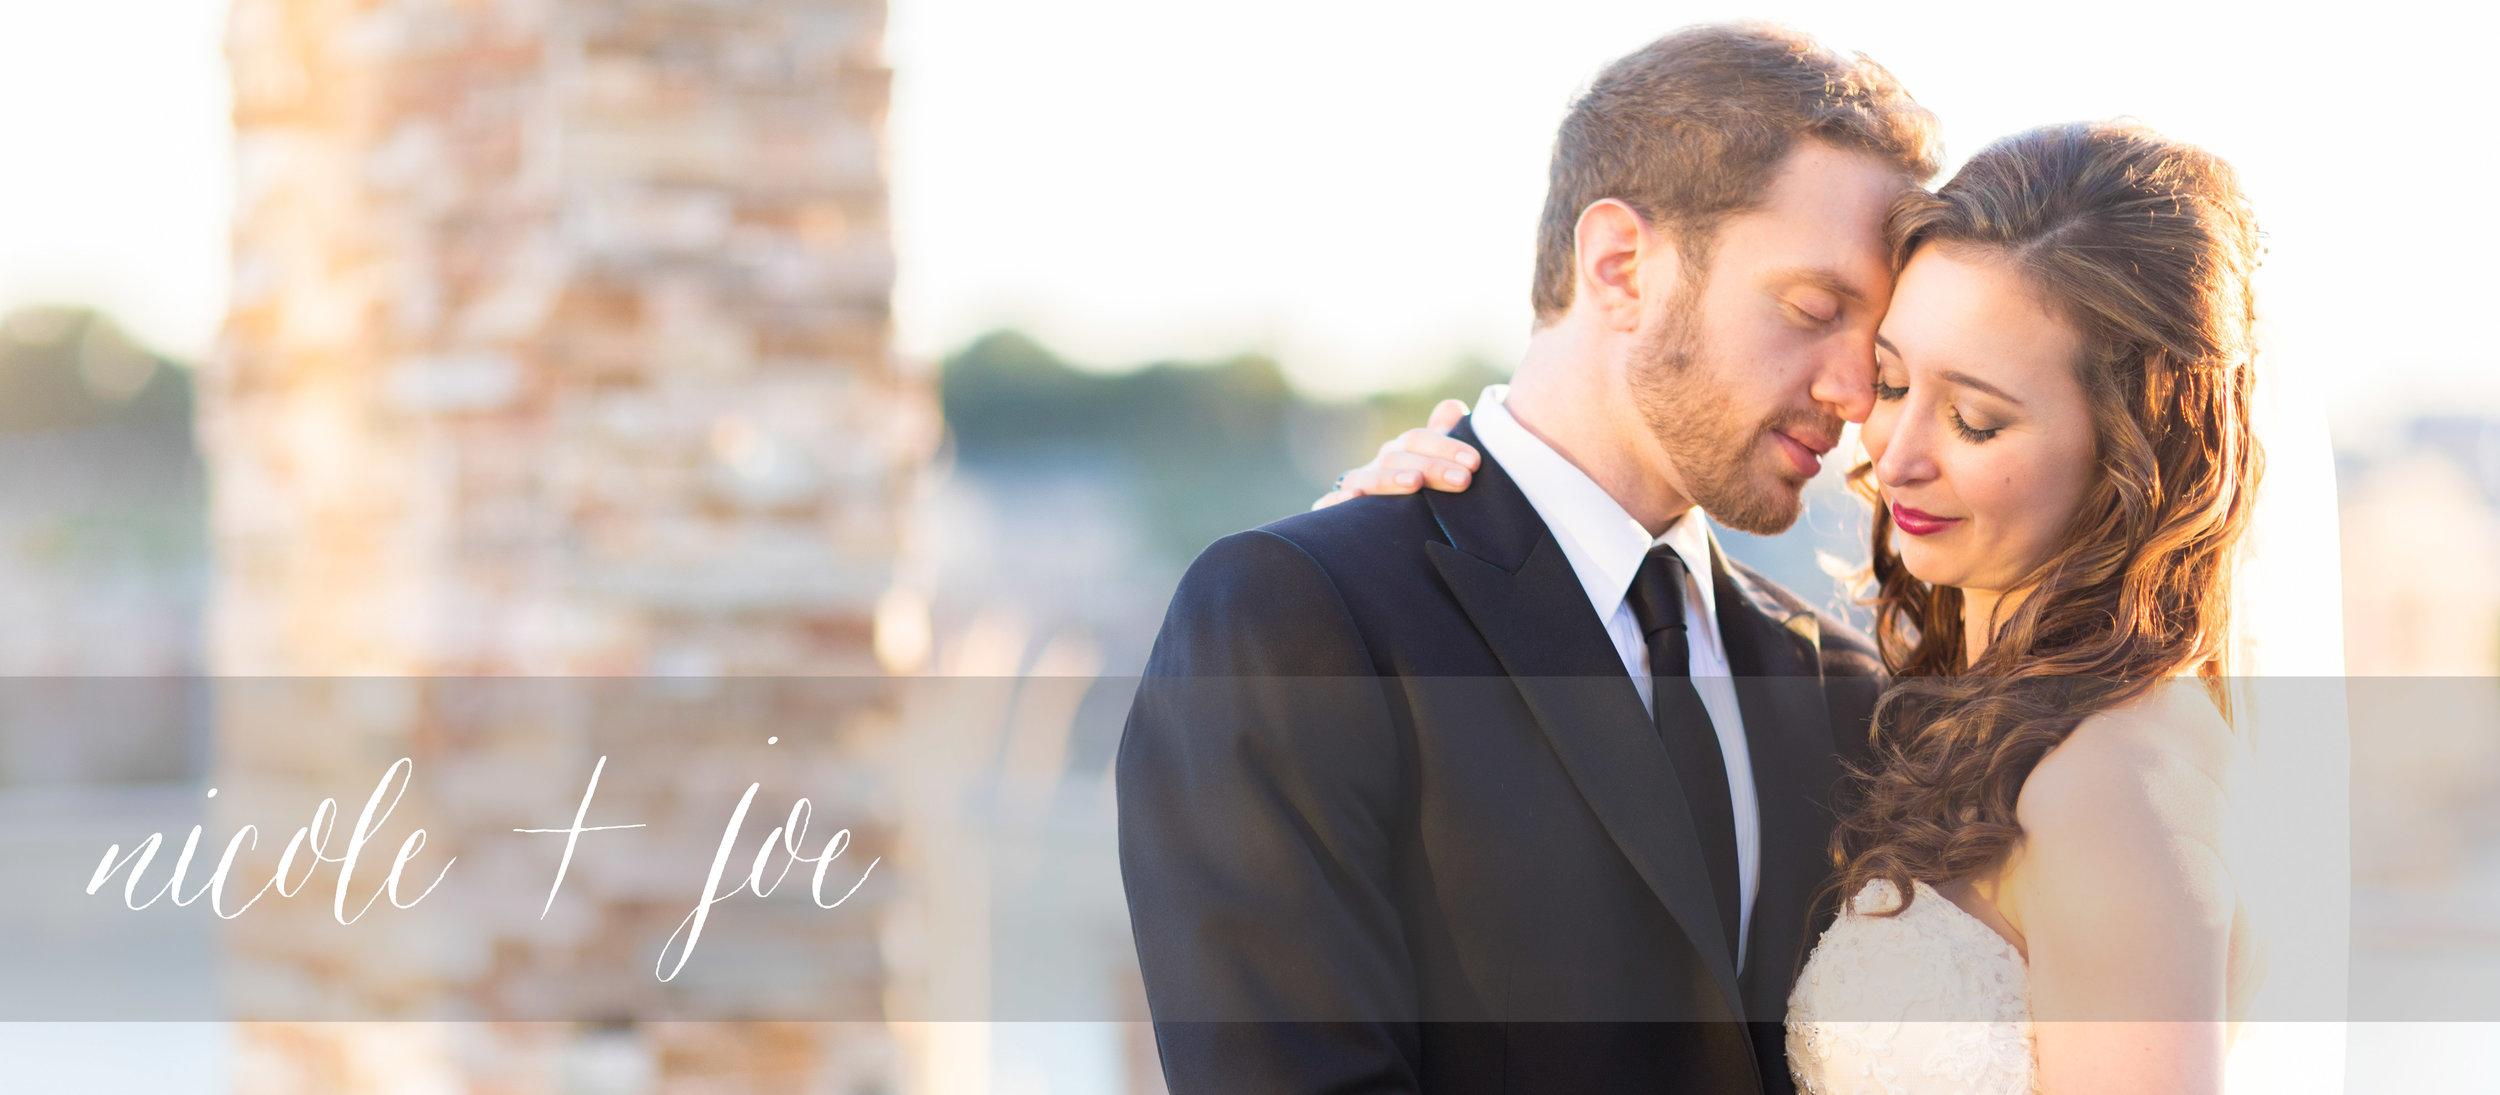 timeless baltimore wedding photography